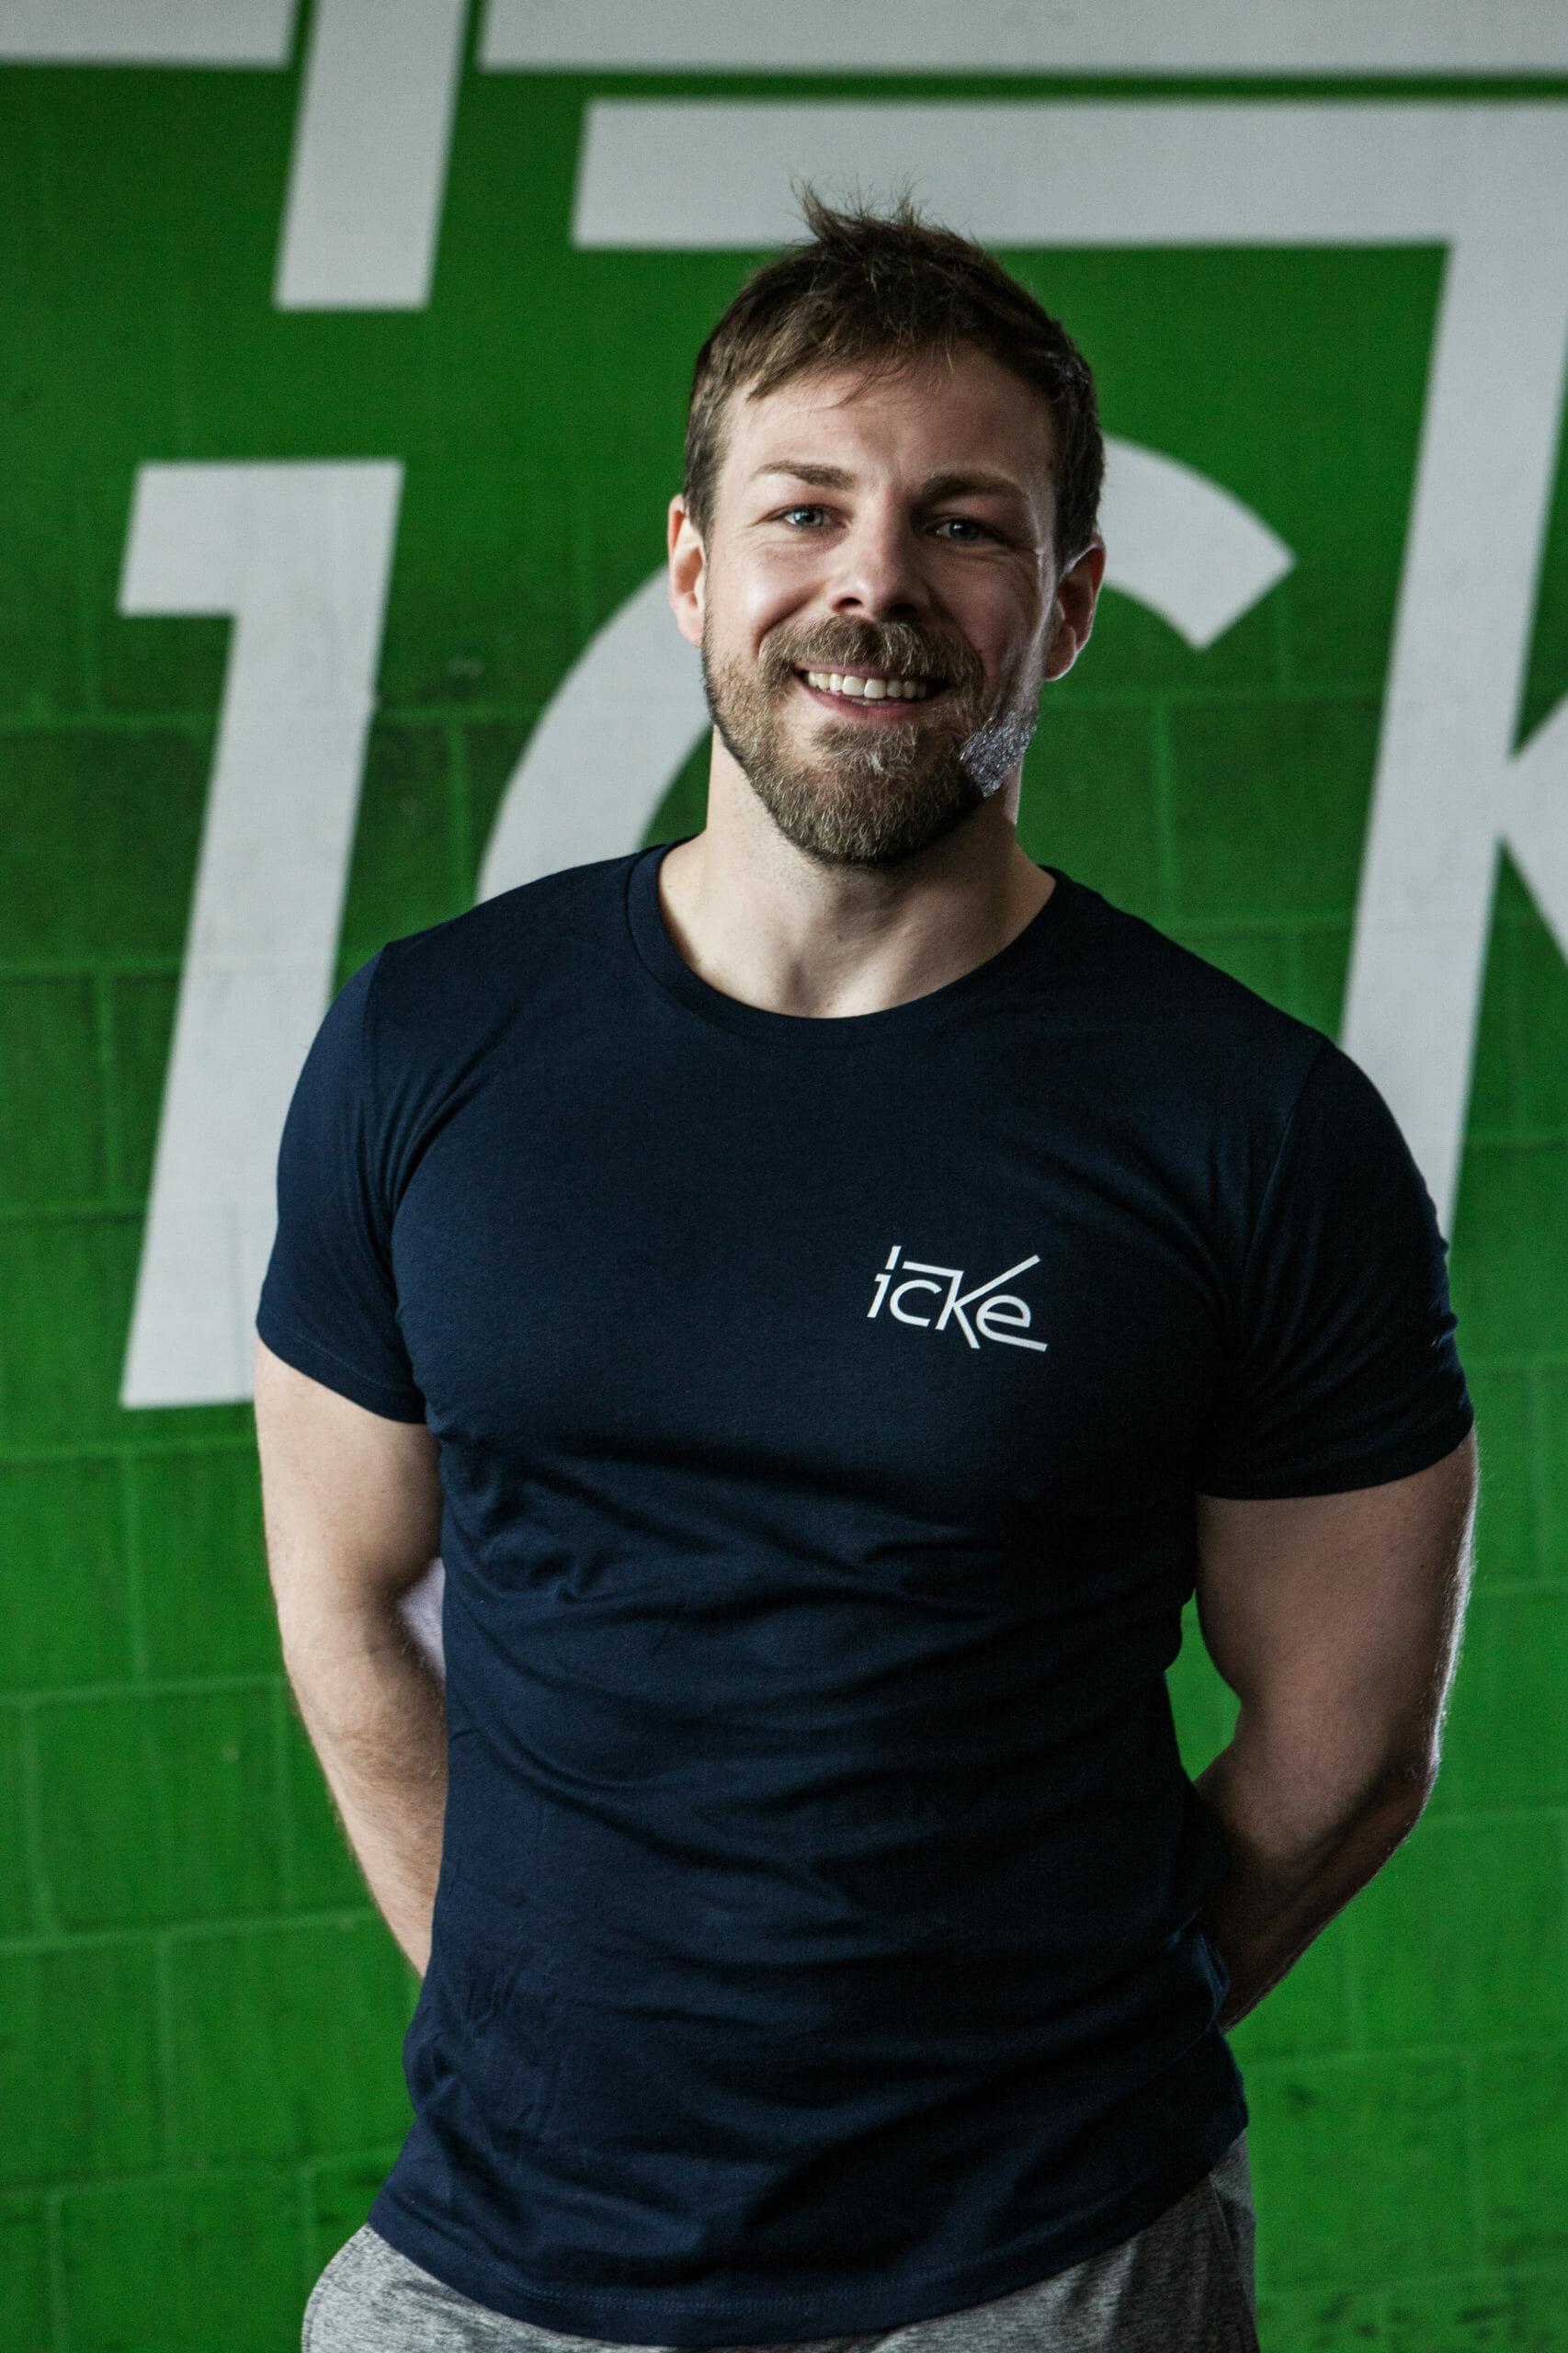 Robin Juckel - Team Icke Training